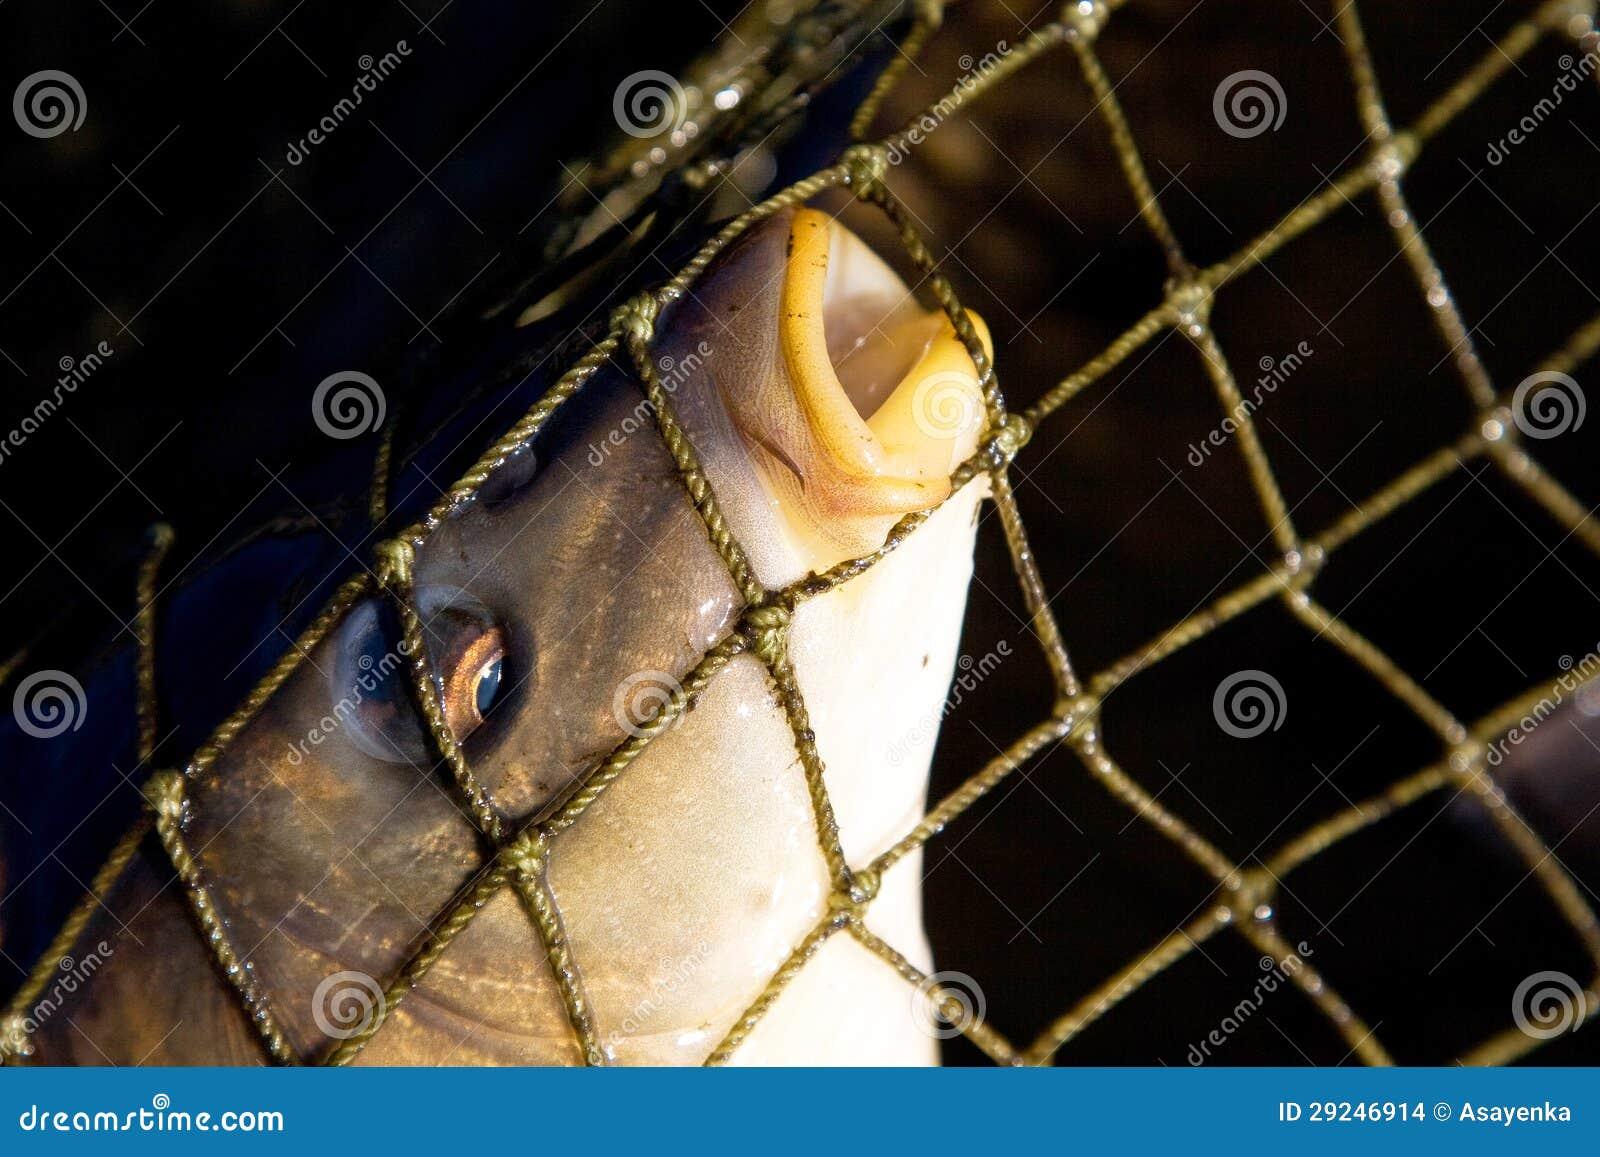 Download Peixes em redes de pesca foto de stock. Imagem de engranzamento - 29246914